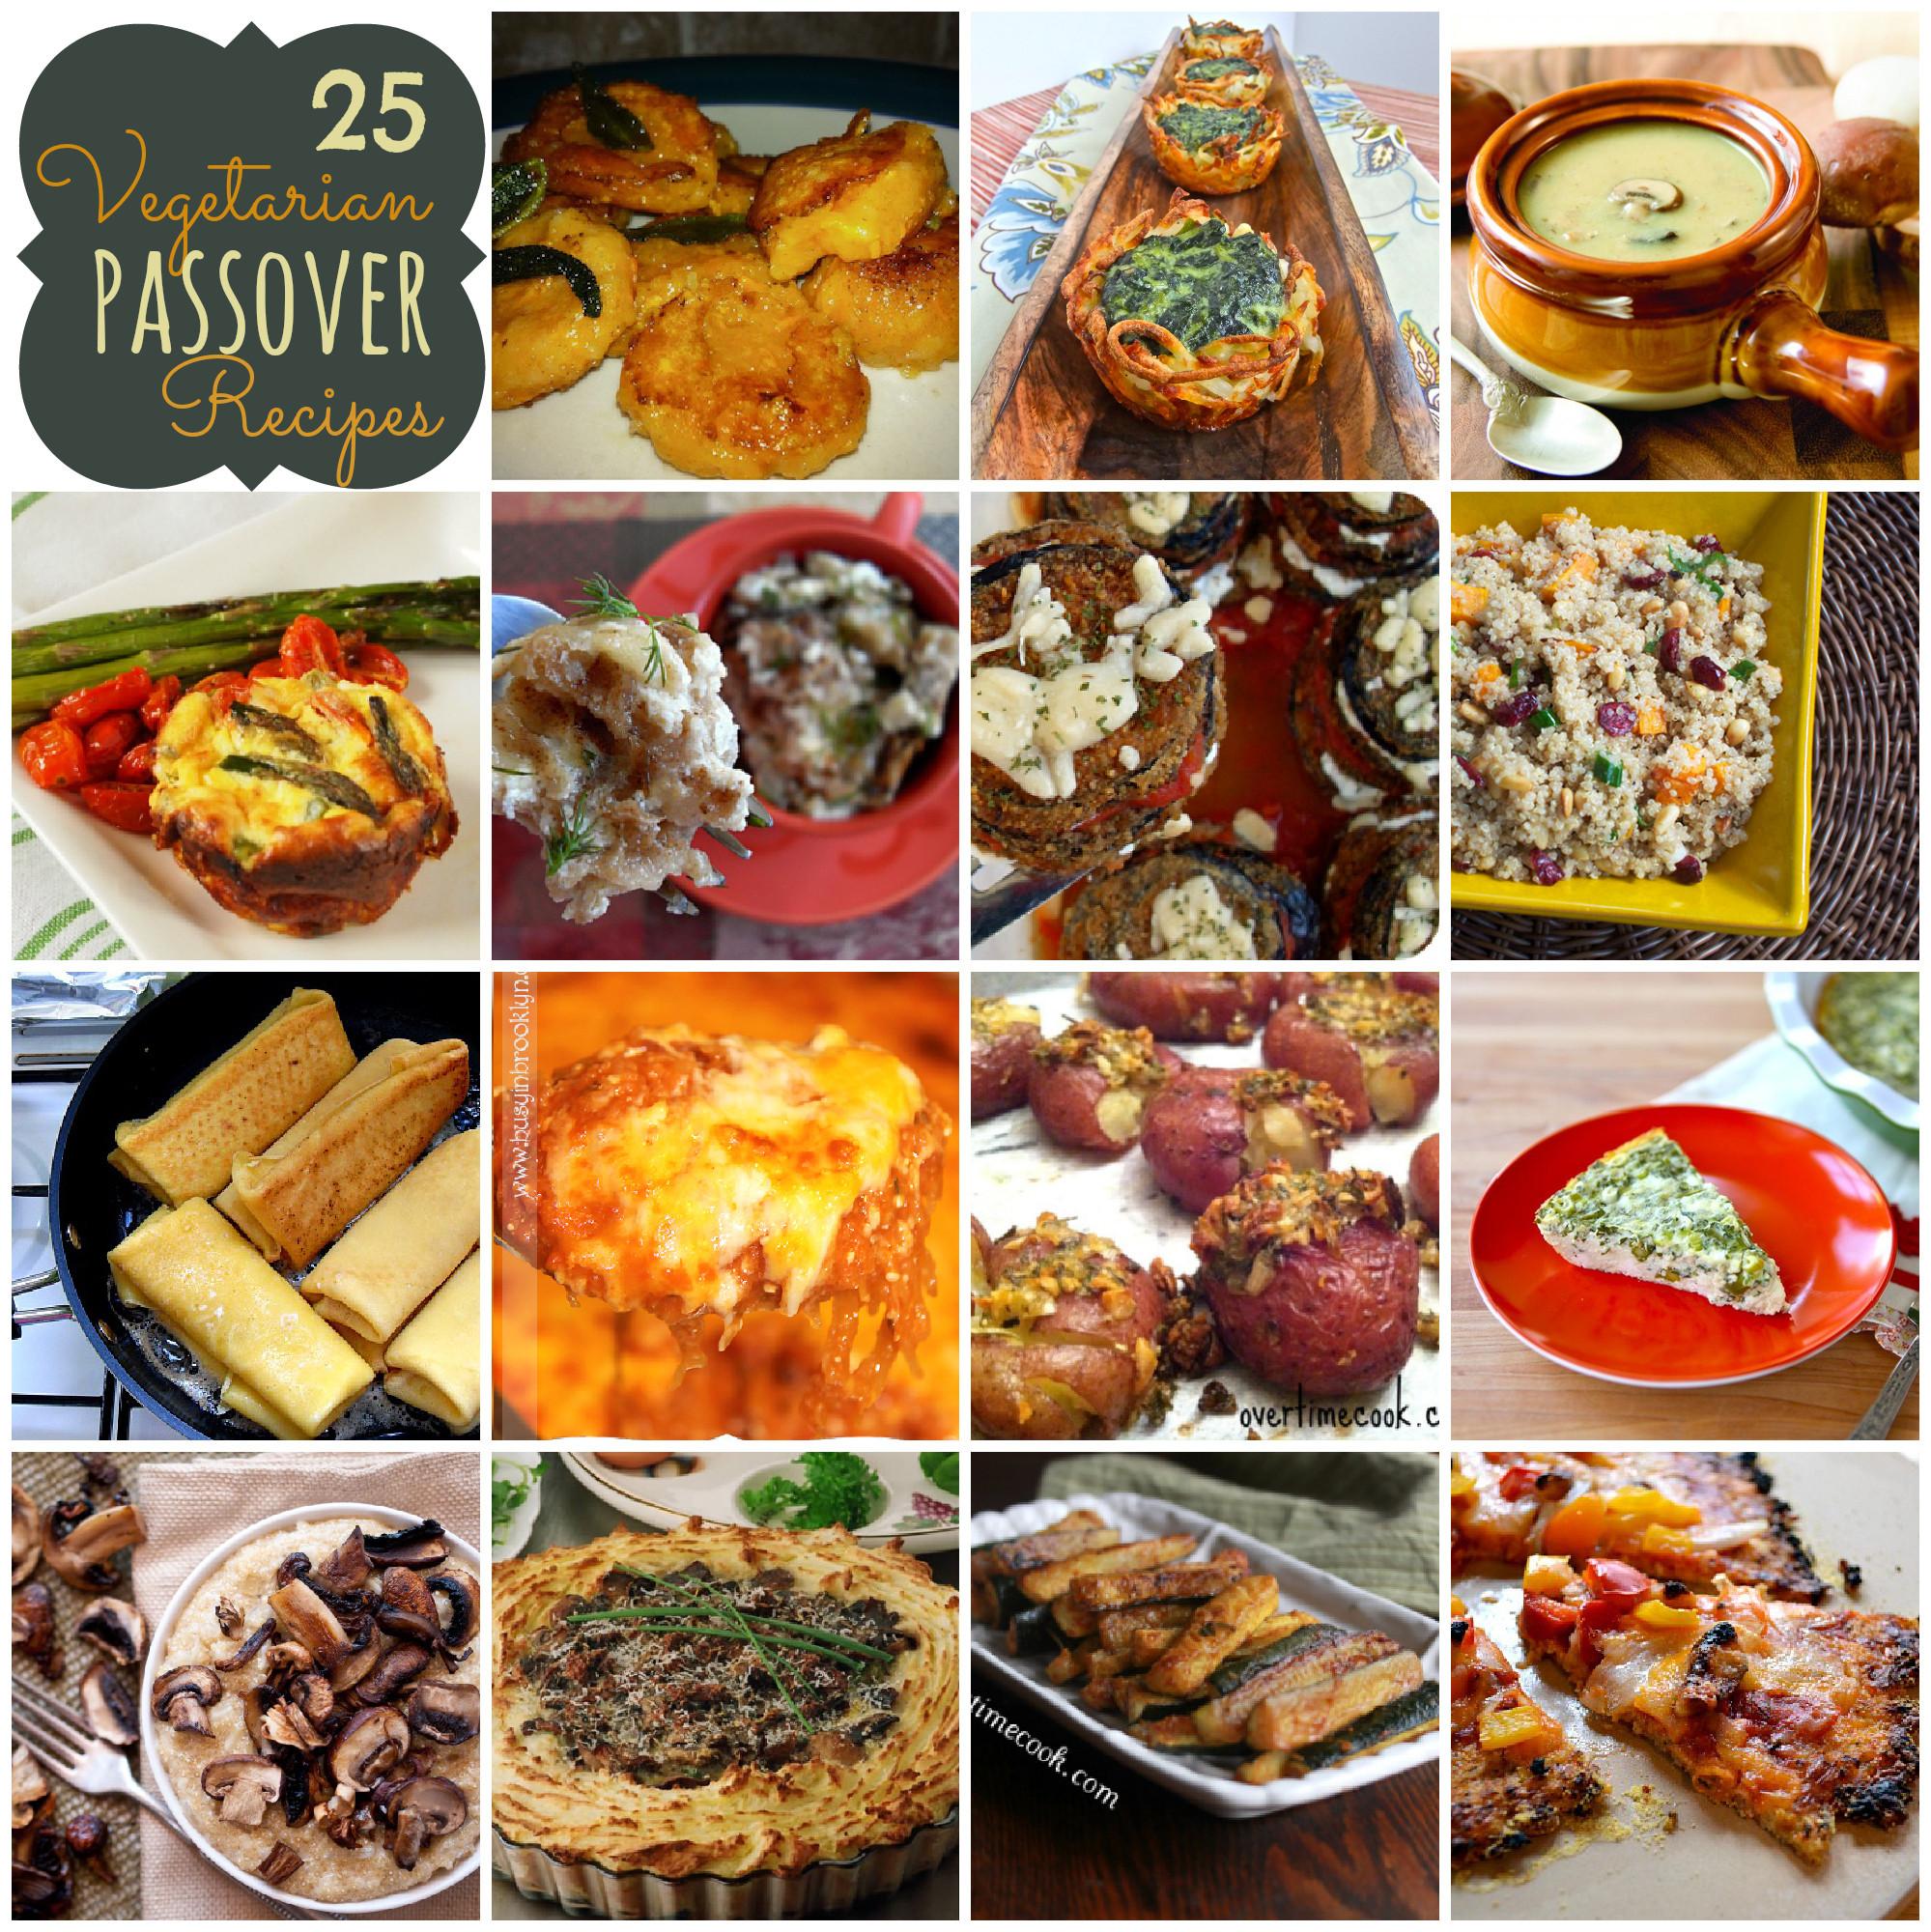 Passover Dinner Recipes  25 Ve arian Passover Recipes